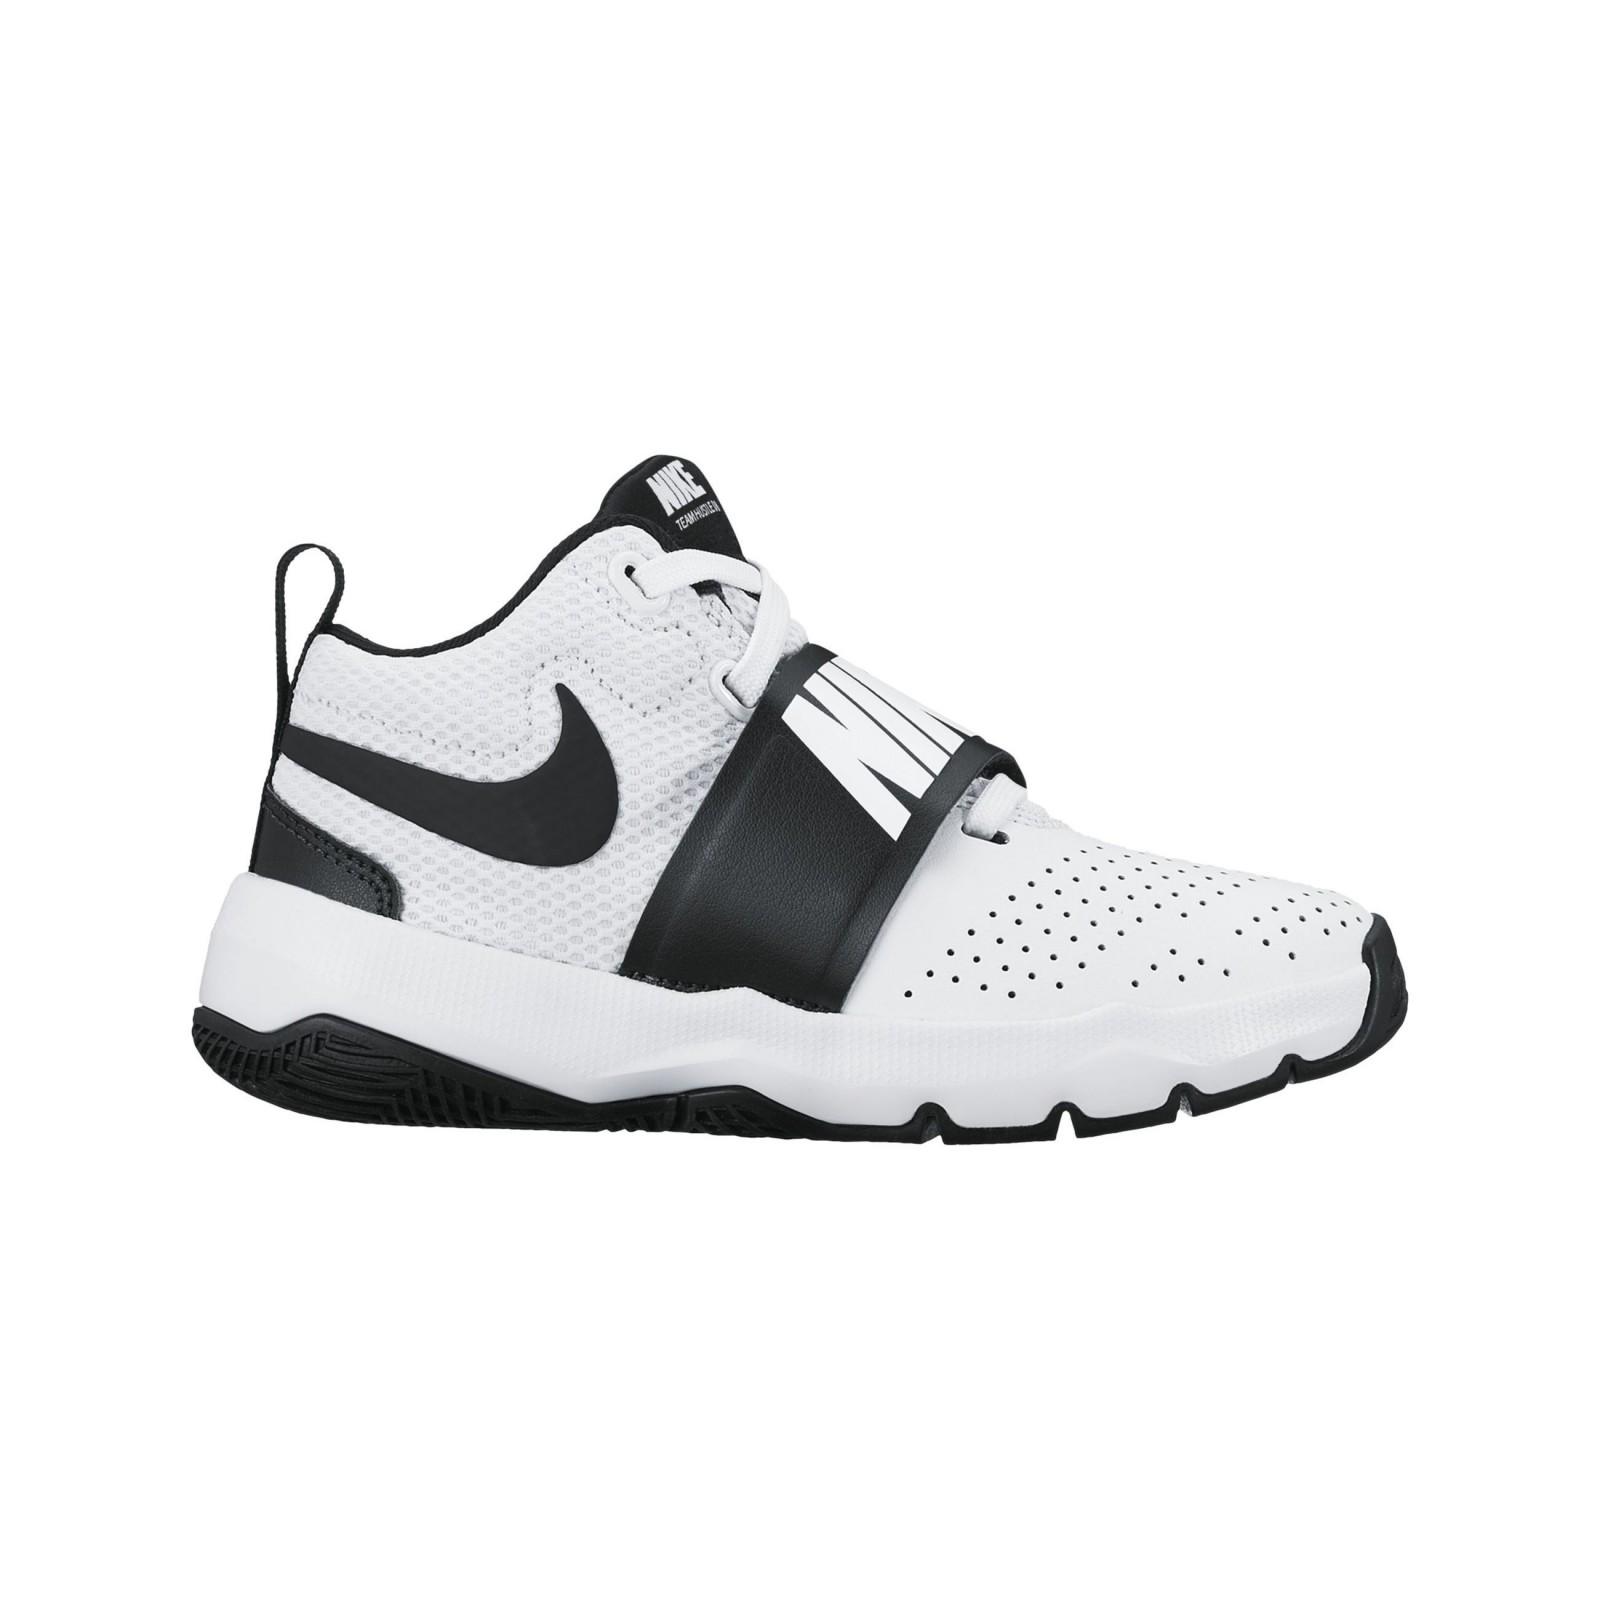 Dětské tenisky Nike TEAM HUSTLE D 8 (PS)  60ab937ff6d